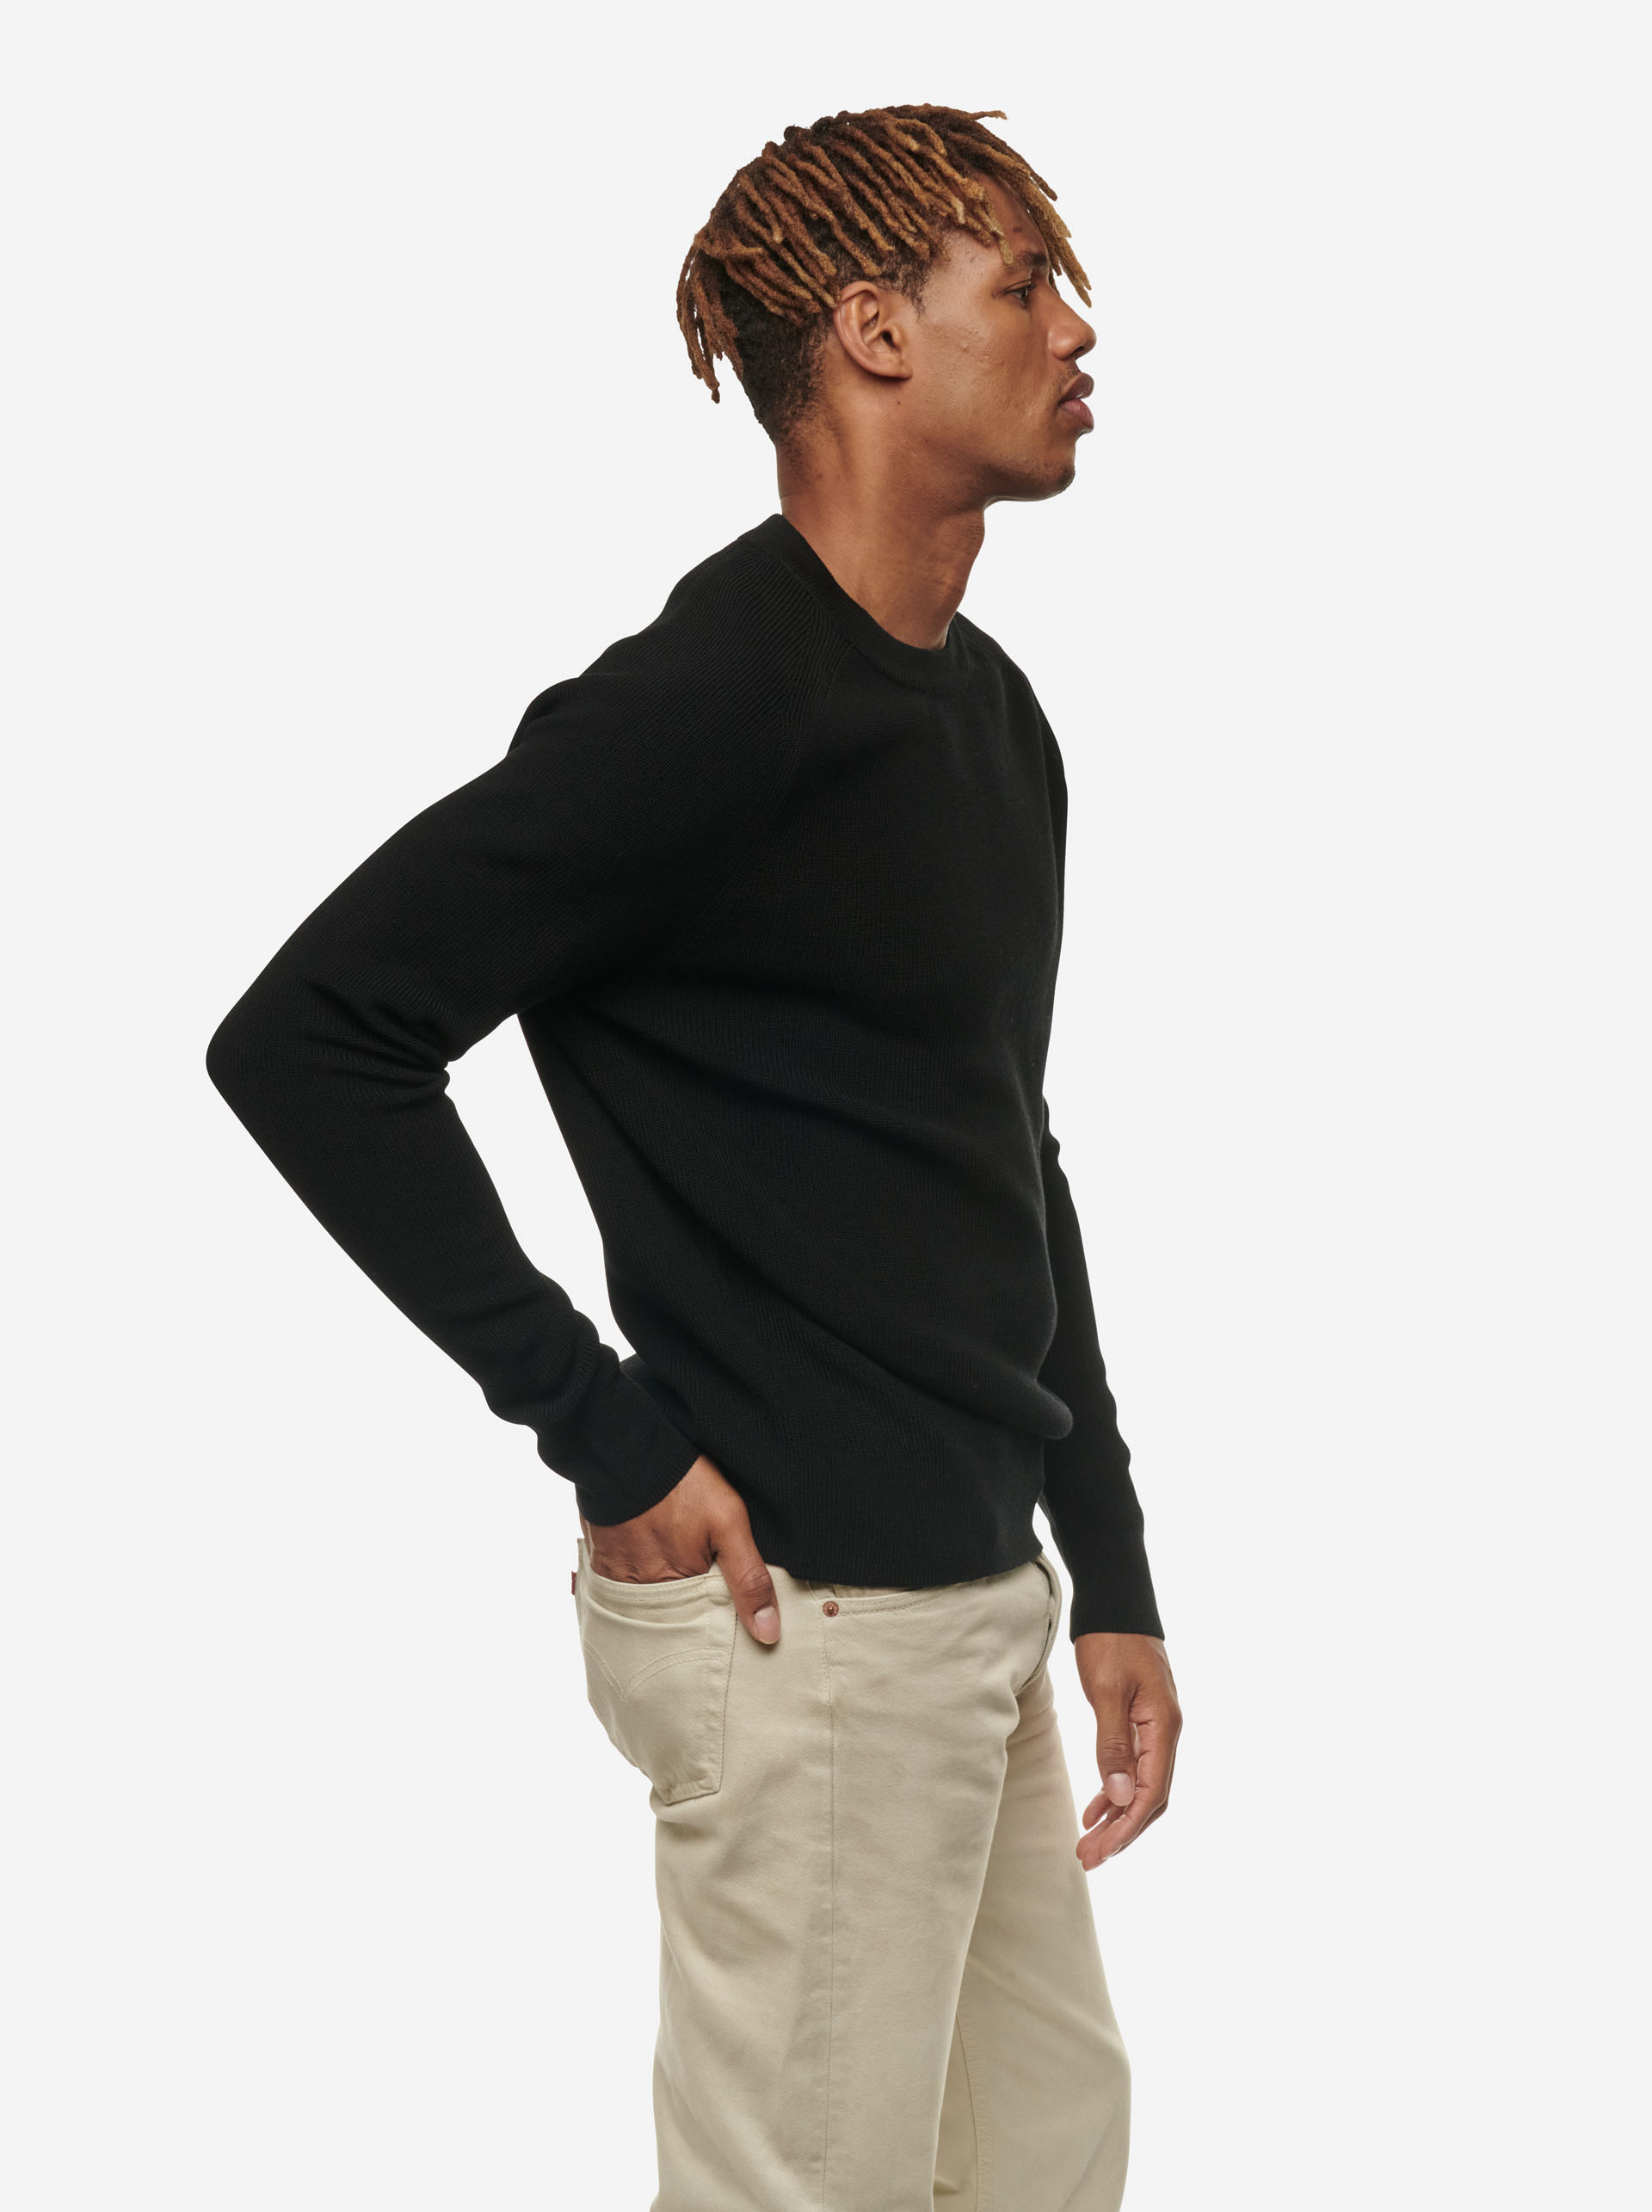 Teym - The Merino Sweater - Men - Black - 8